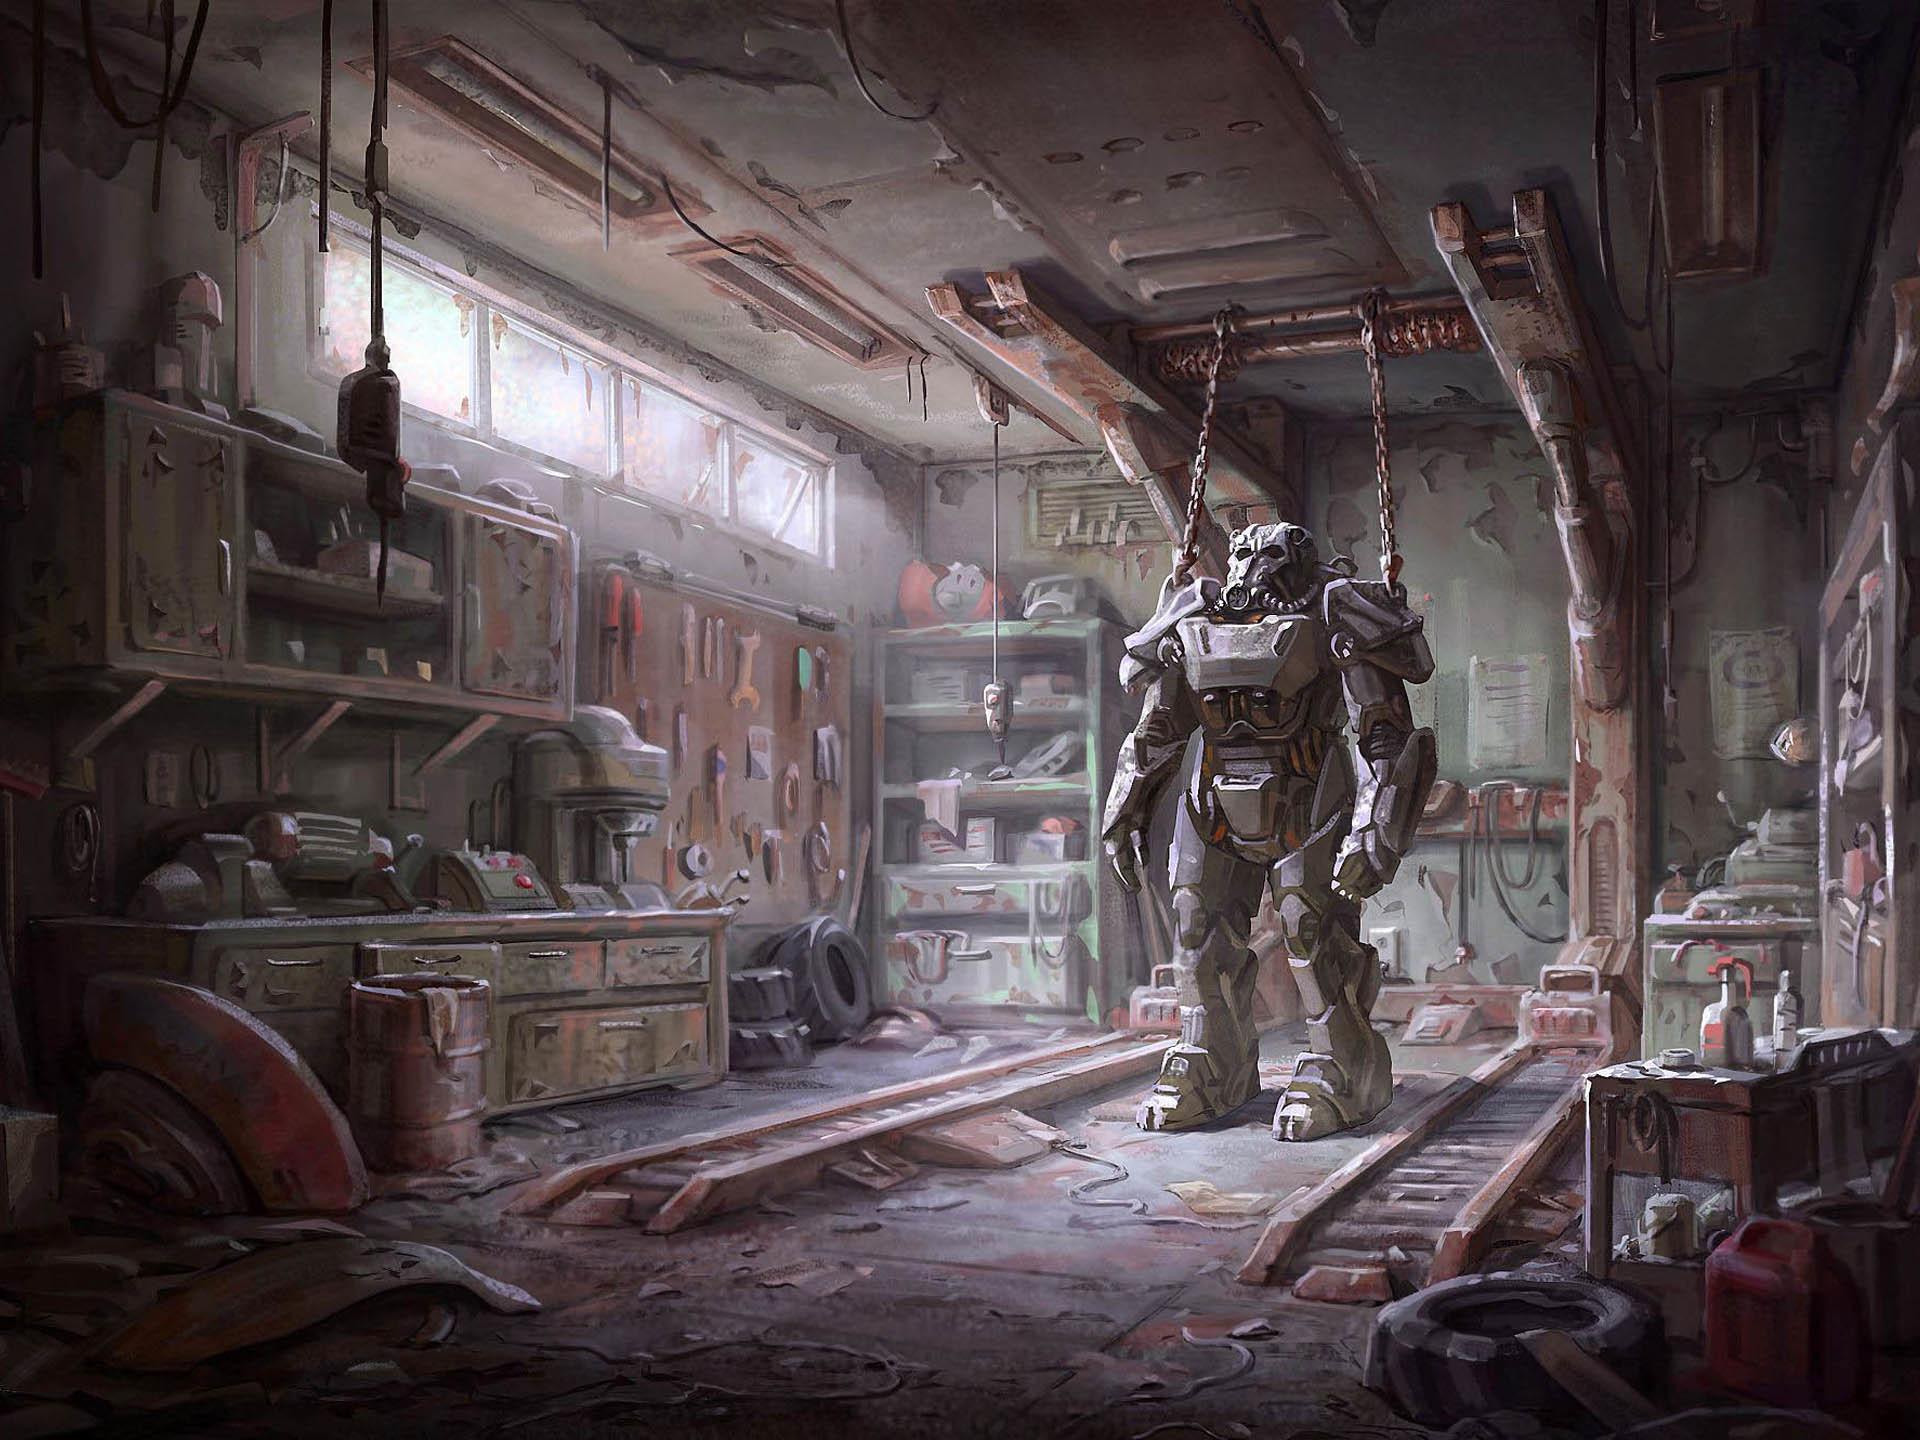 Fallout 4 Concept Art – Armor in the Garage wallpaper